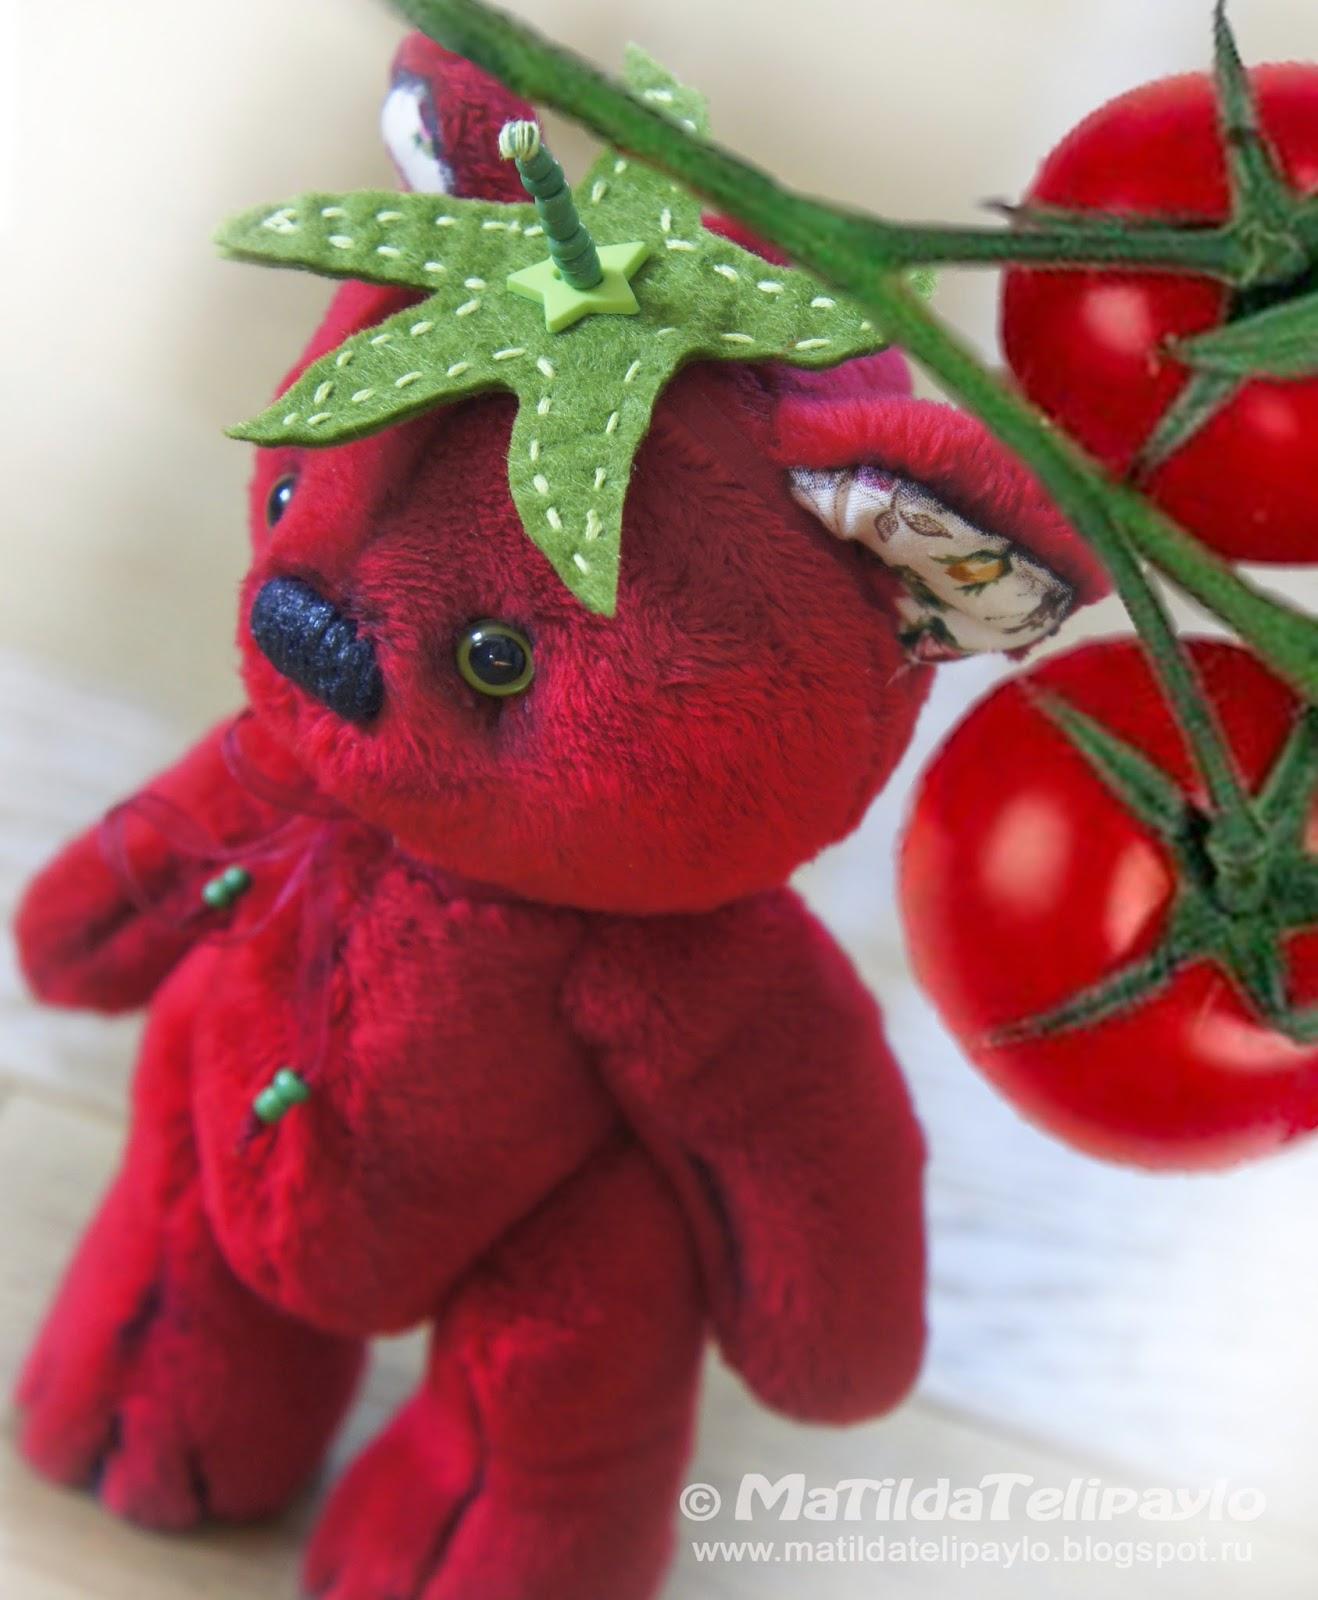 Мишка, помидор, ручная работа, hand-made